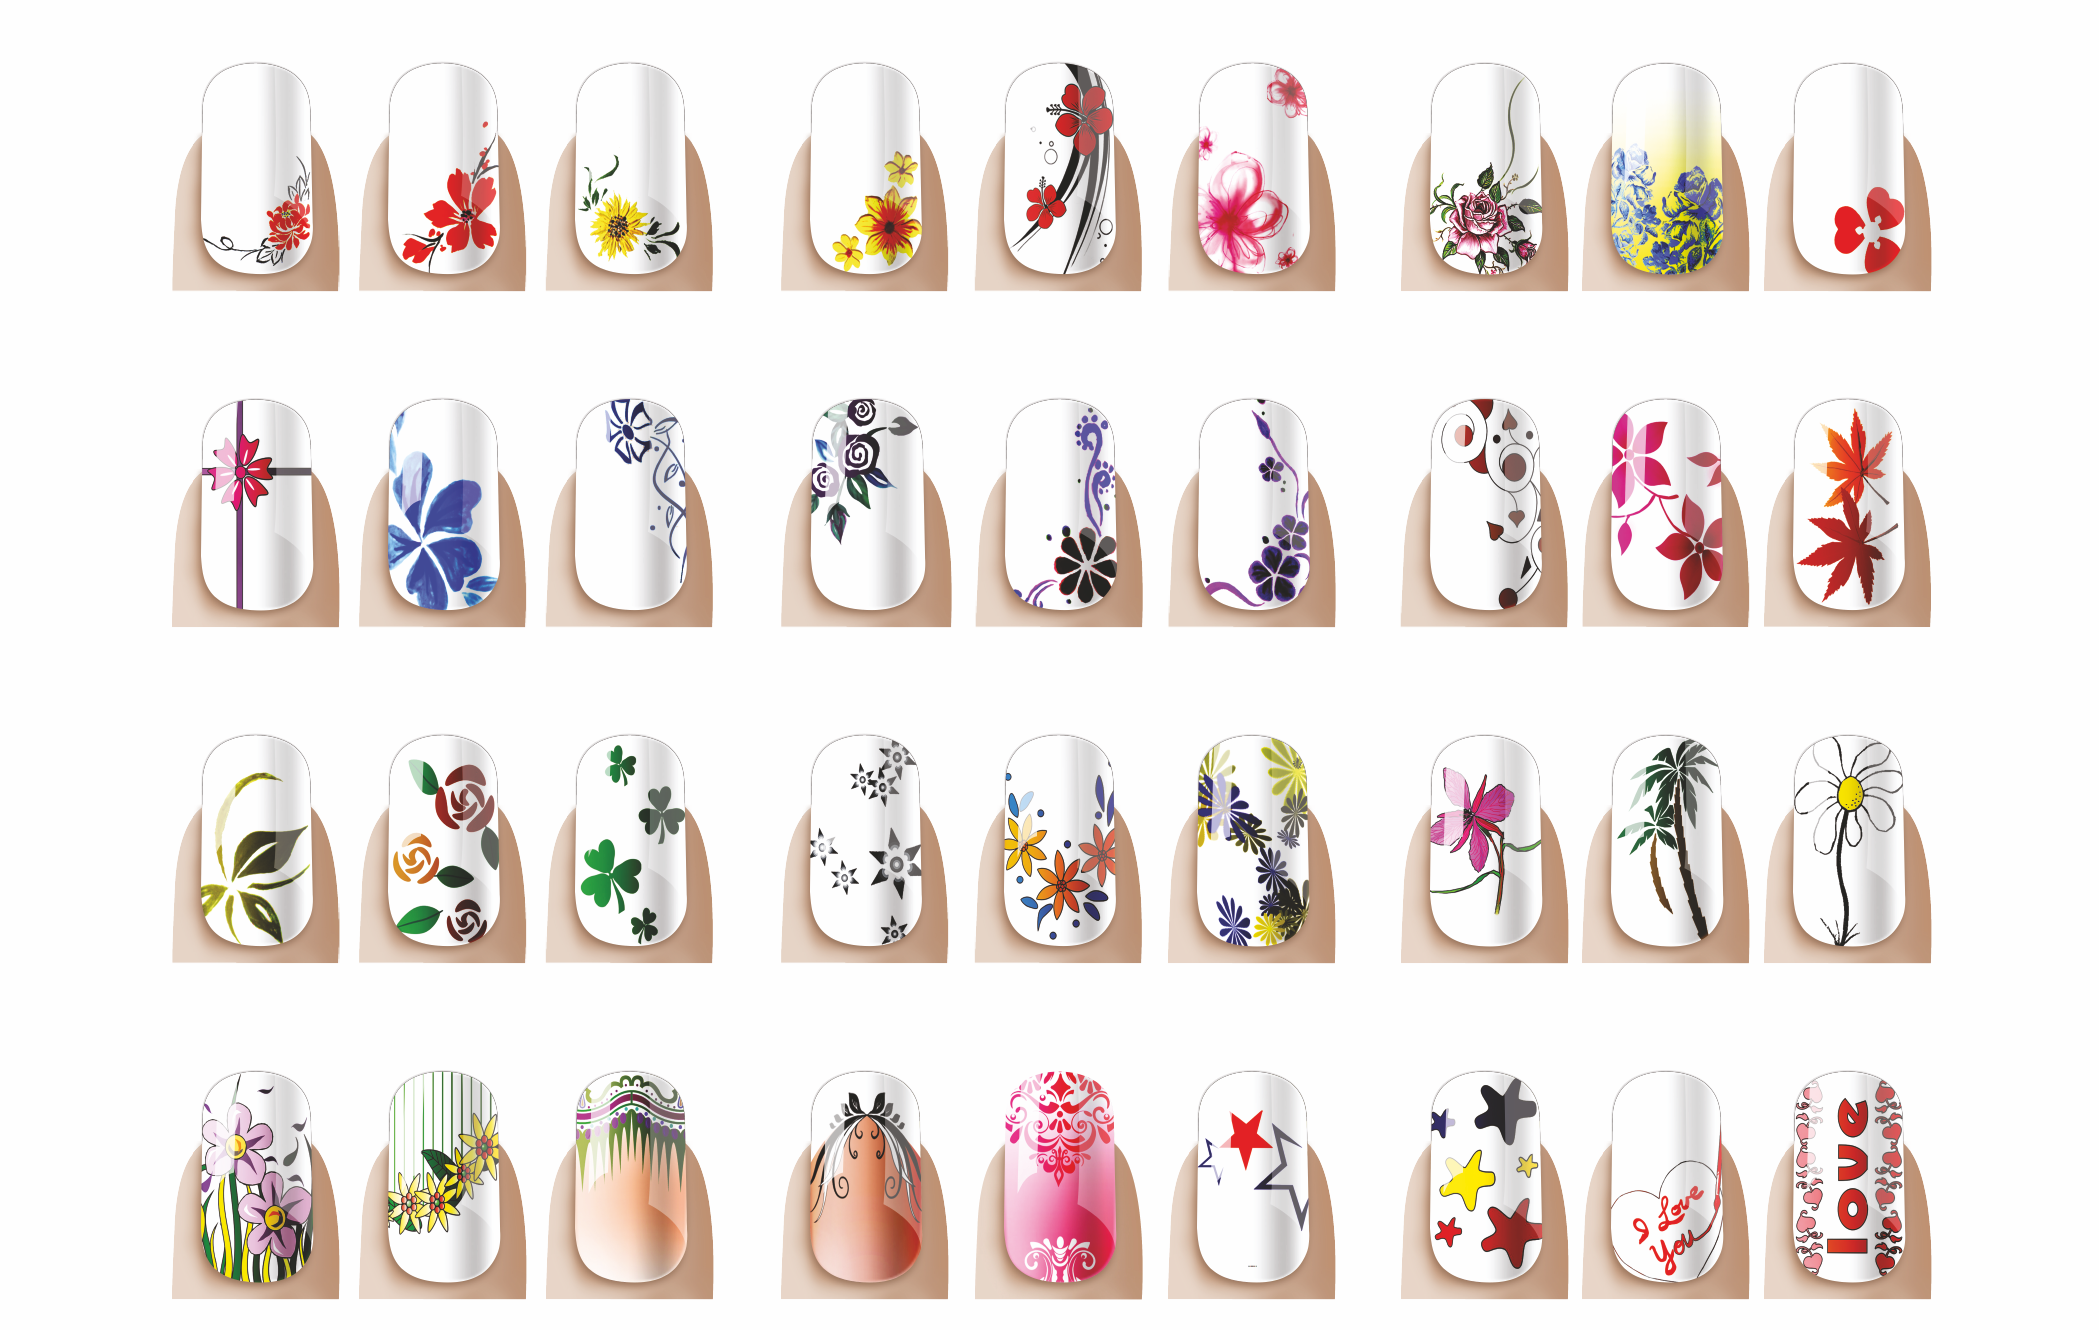 nail-art-print-beautypopup-boulogne-billancourt